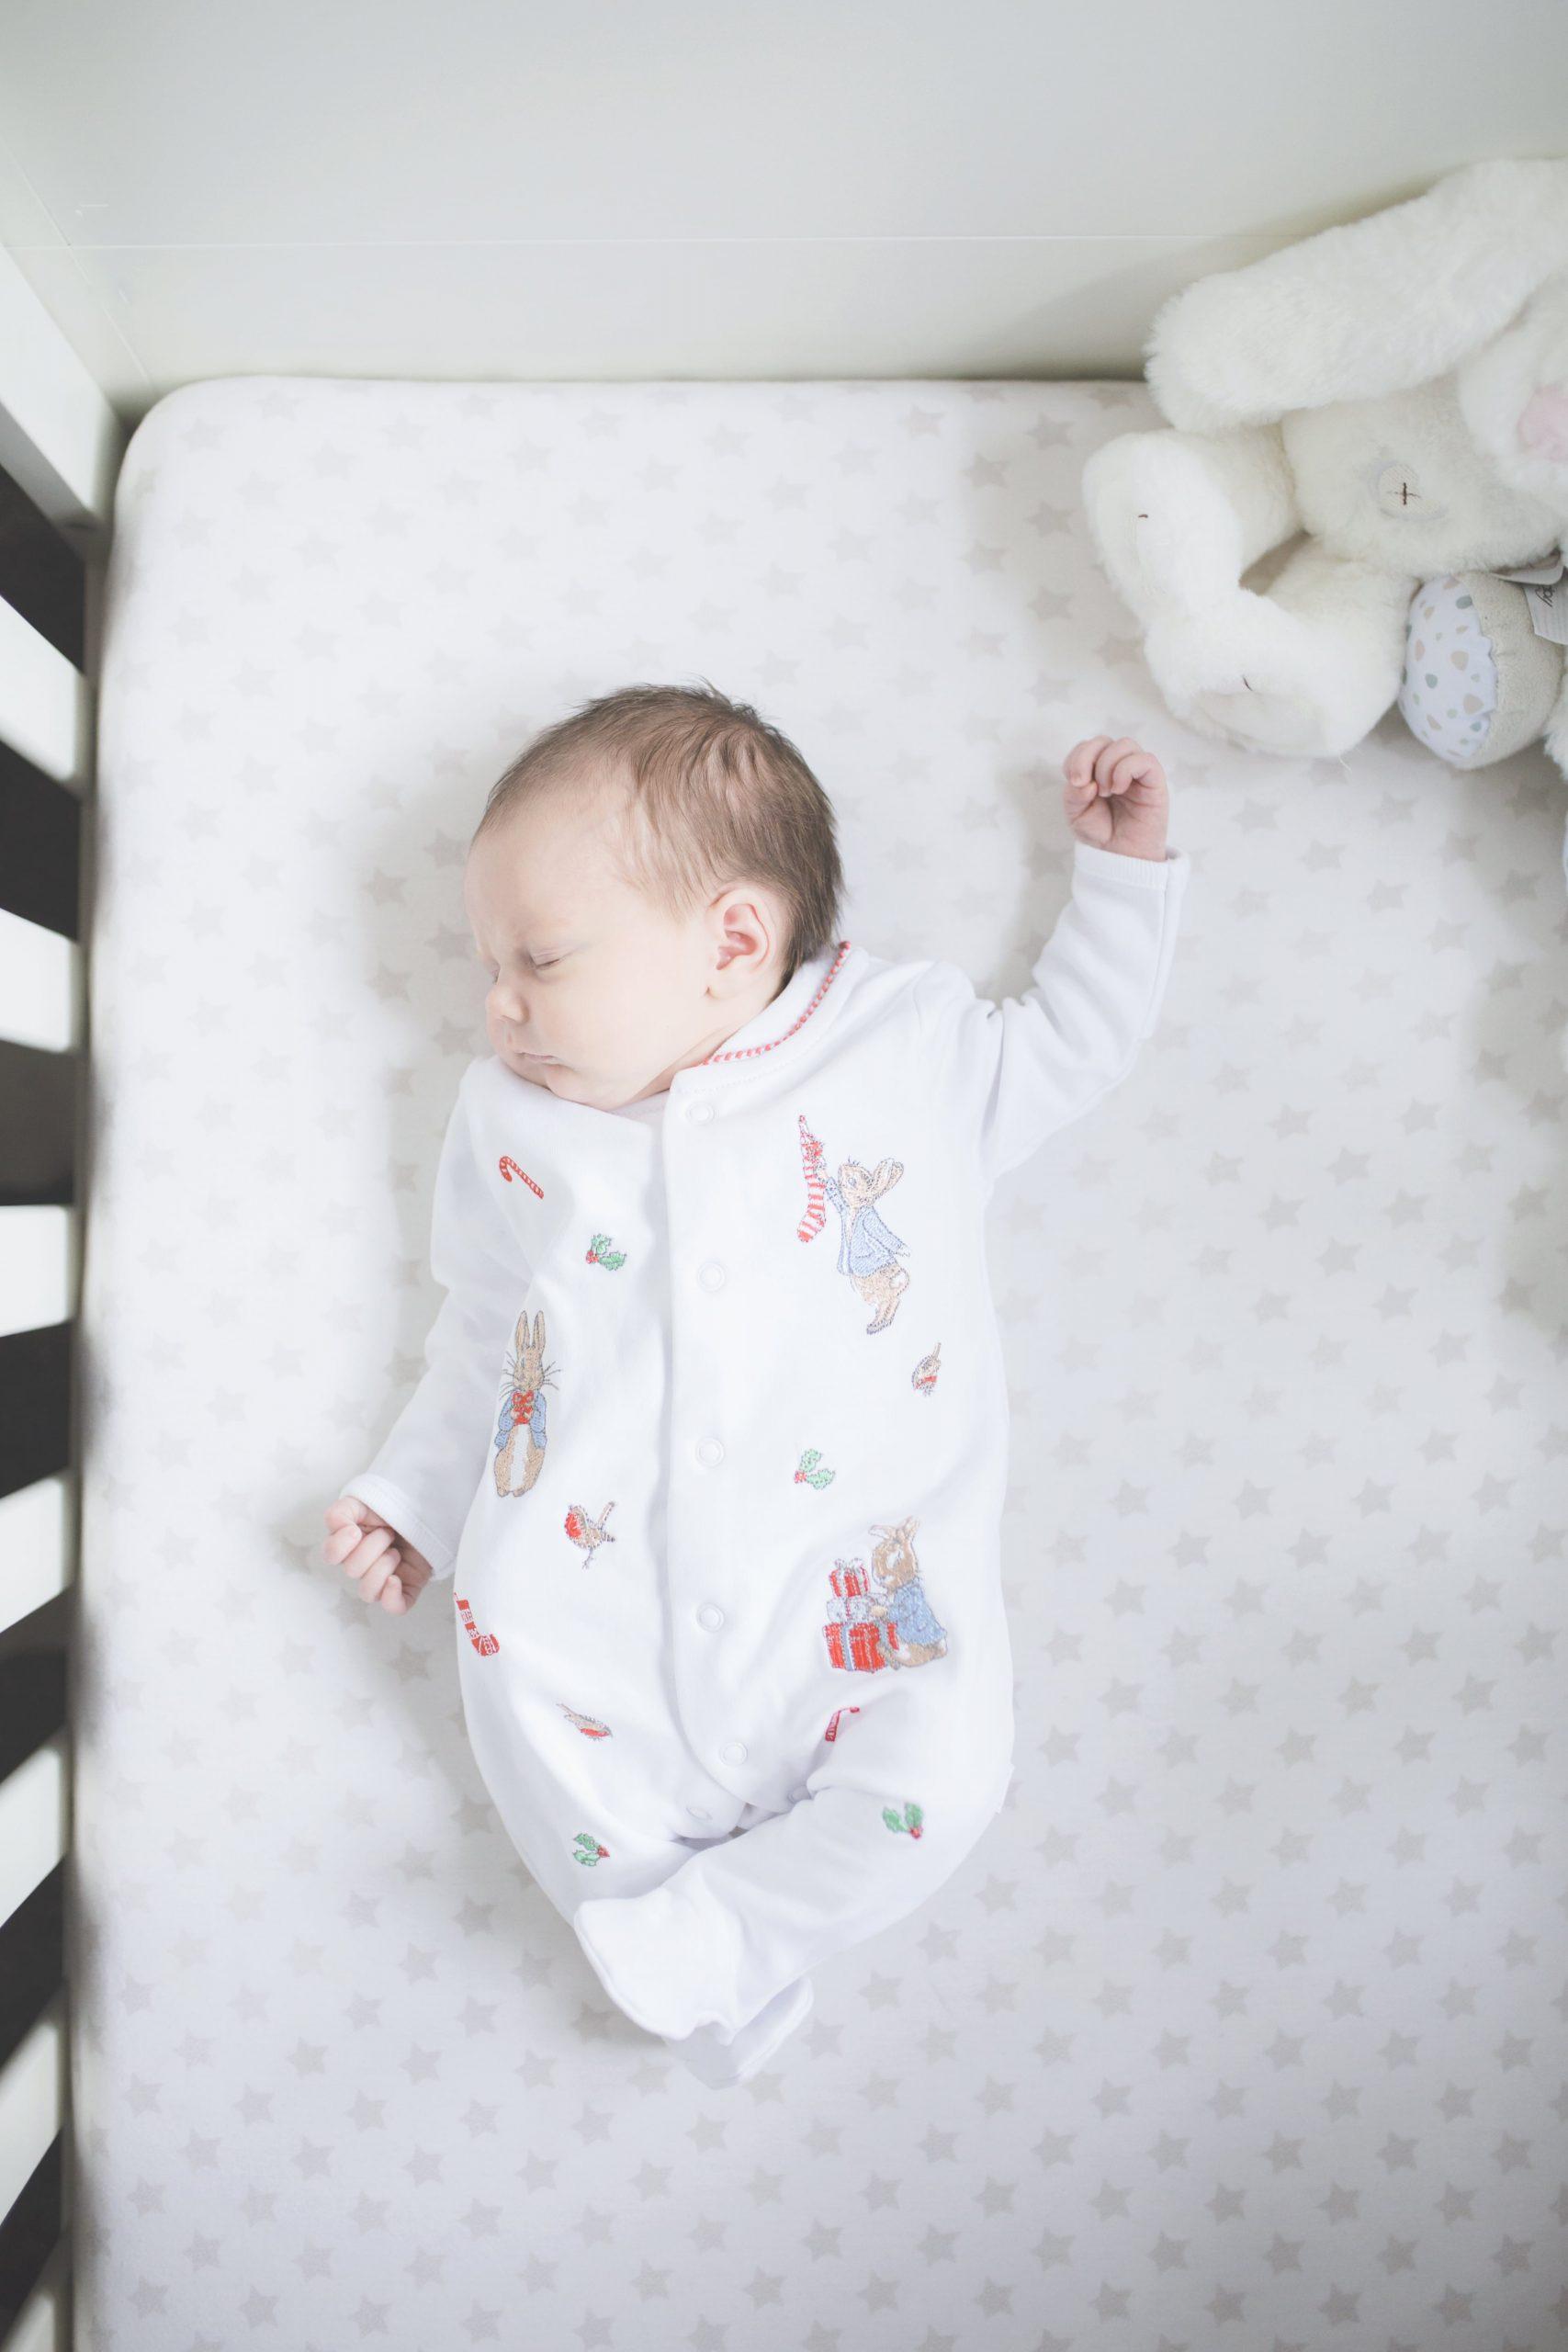 Newnborn taking a nap